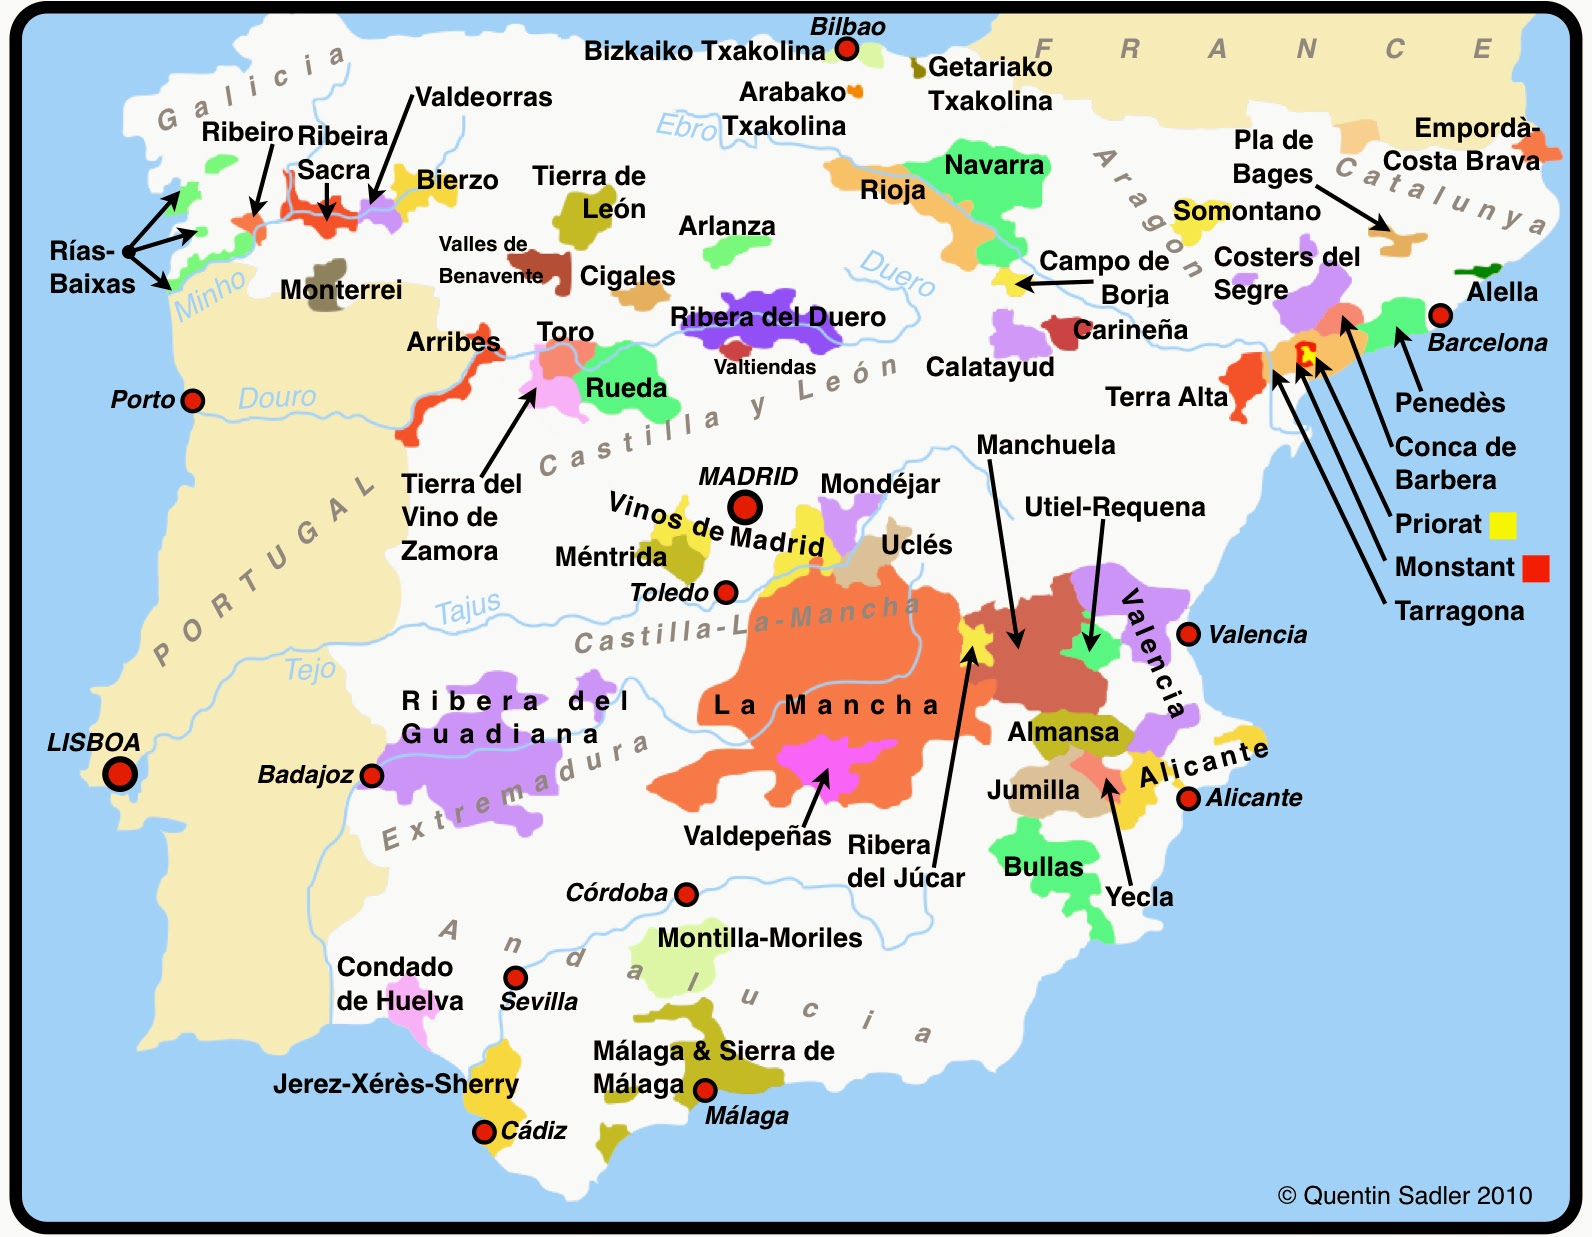 mapa espanha andaluzia In Vino Viajas : Enoturismo inteligente na Andaluzia, Espanha  mapa espanha andaluzia